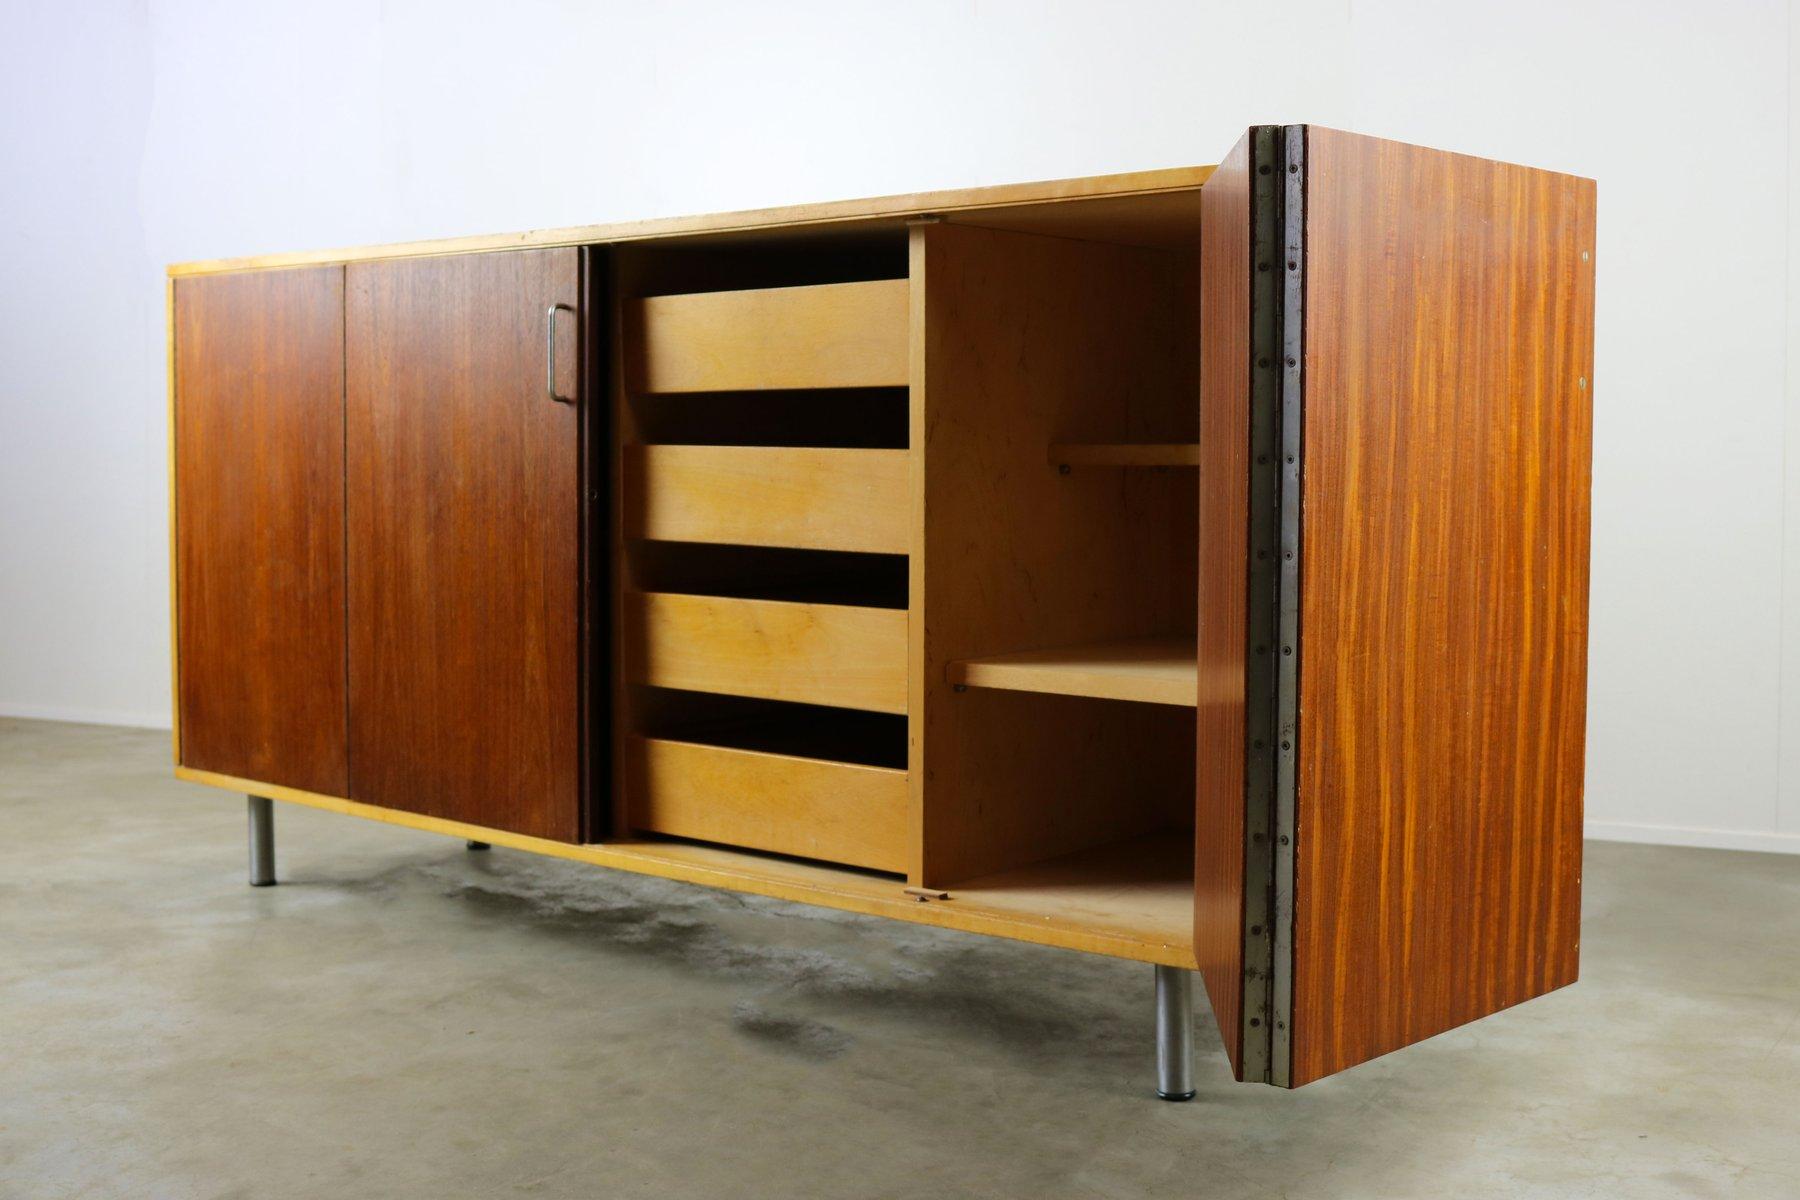 birch teak combex series db02 lowboard by cees braakman. Black Bedroom Furniture Sets. Home Design Ideas